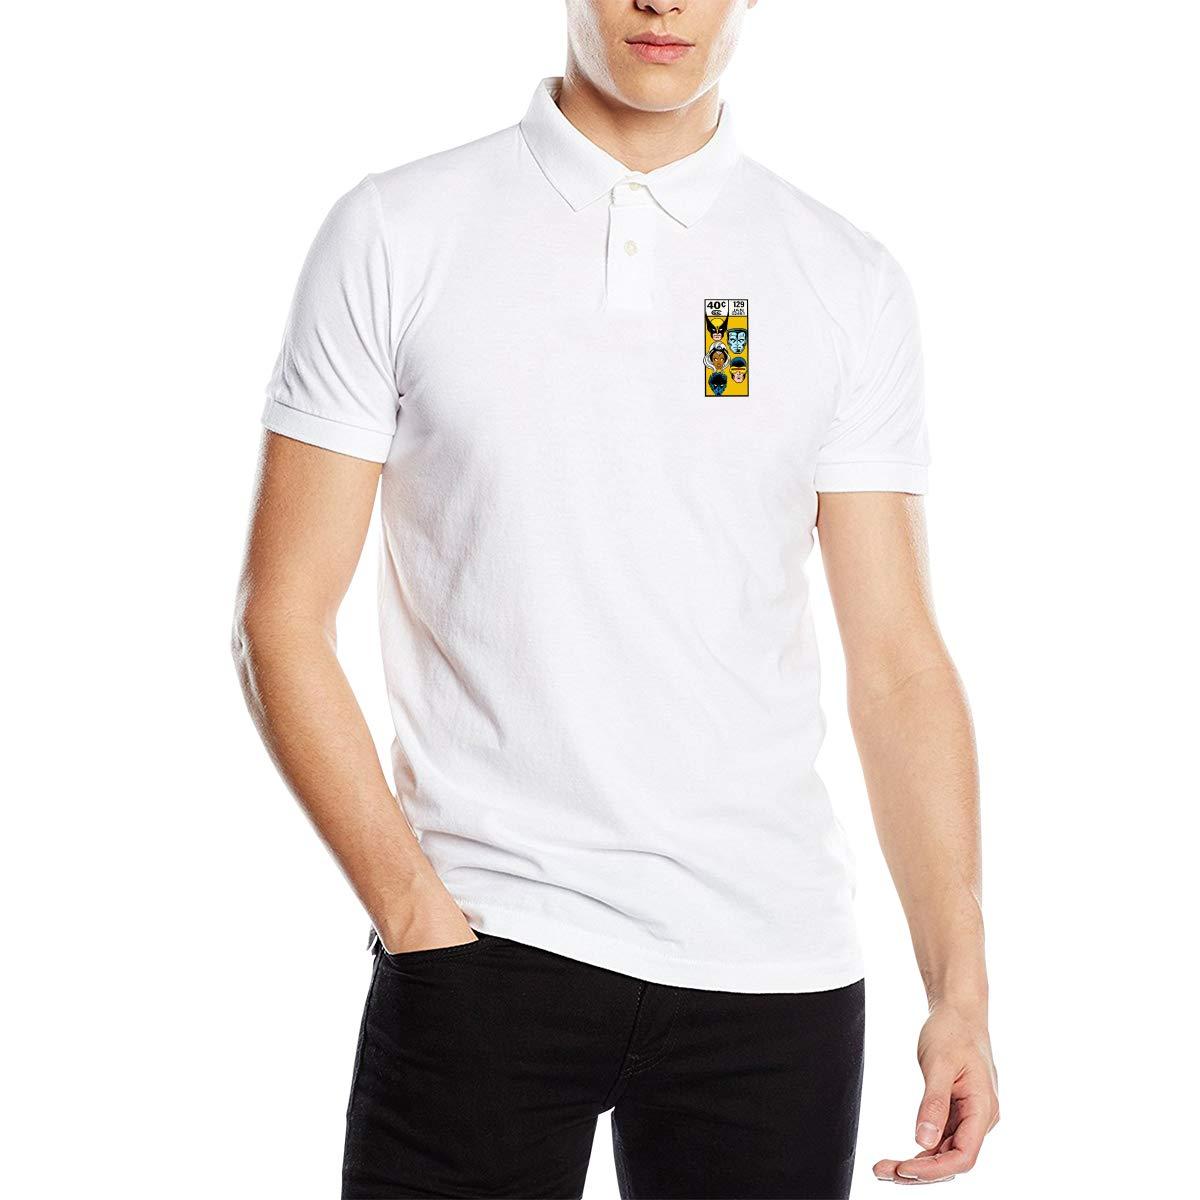 VER Corner Art Mens Regular-Fit Cotton Polo Shirt Short Sleeve EN FA CES CO X-M